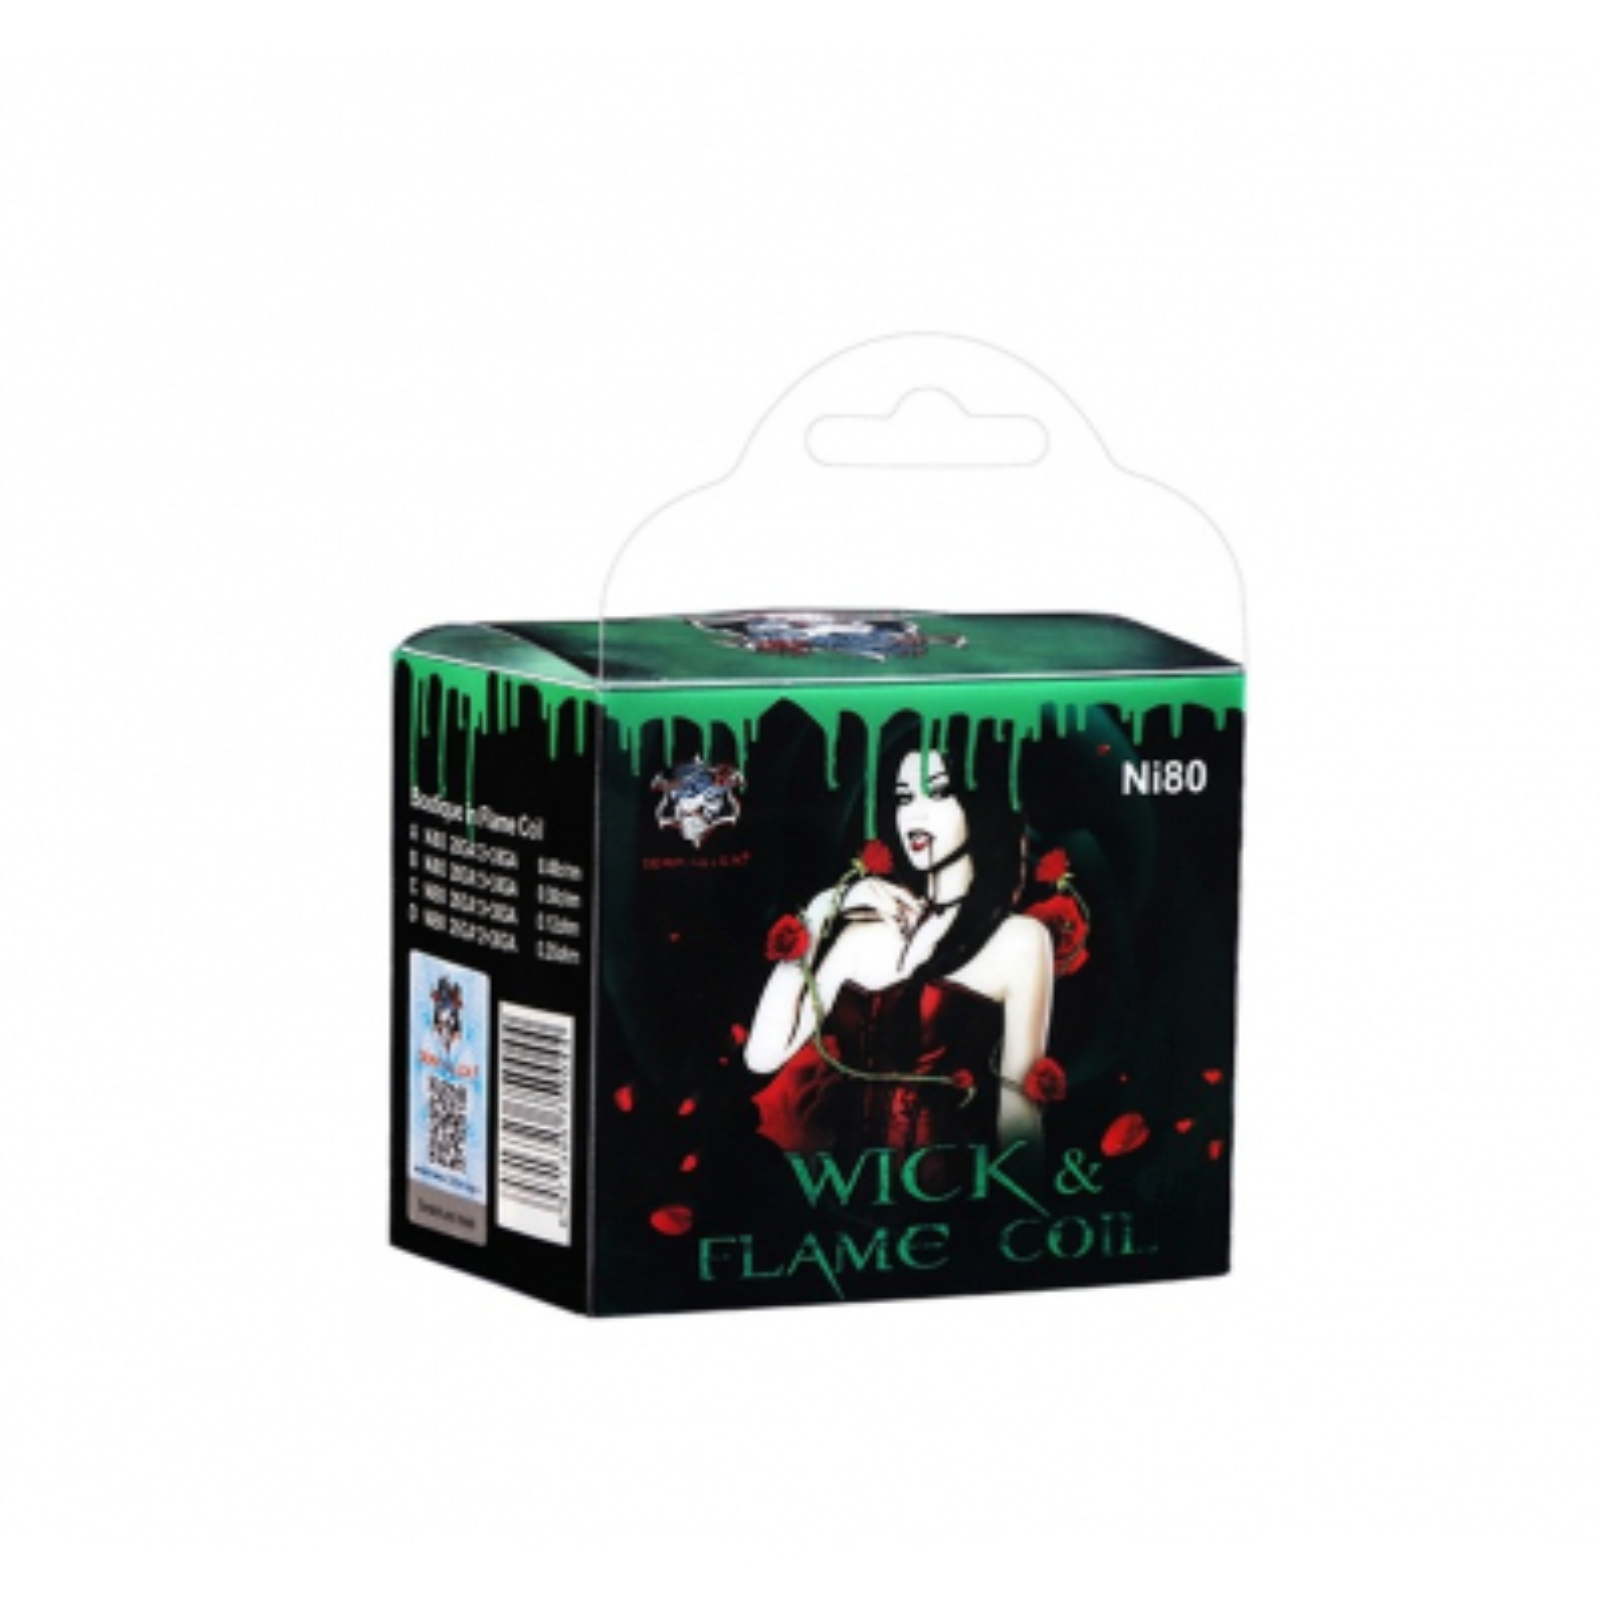 Wick & Flame Coil Ni80 - Demon Killer